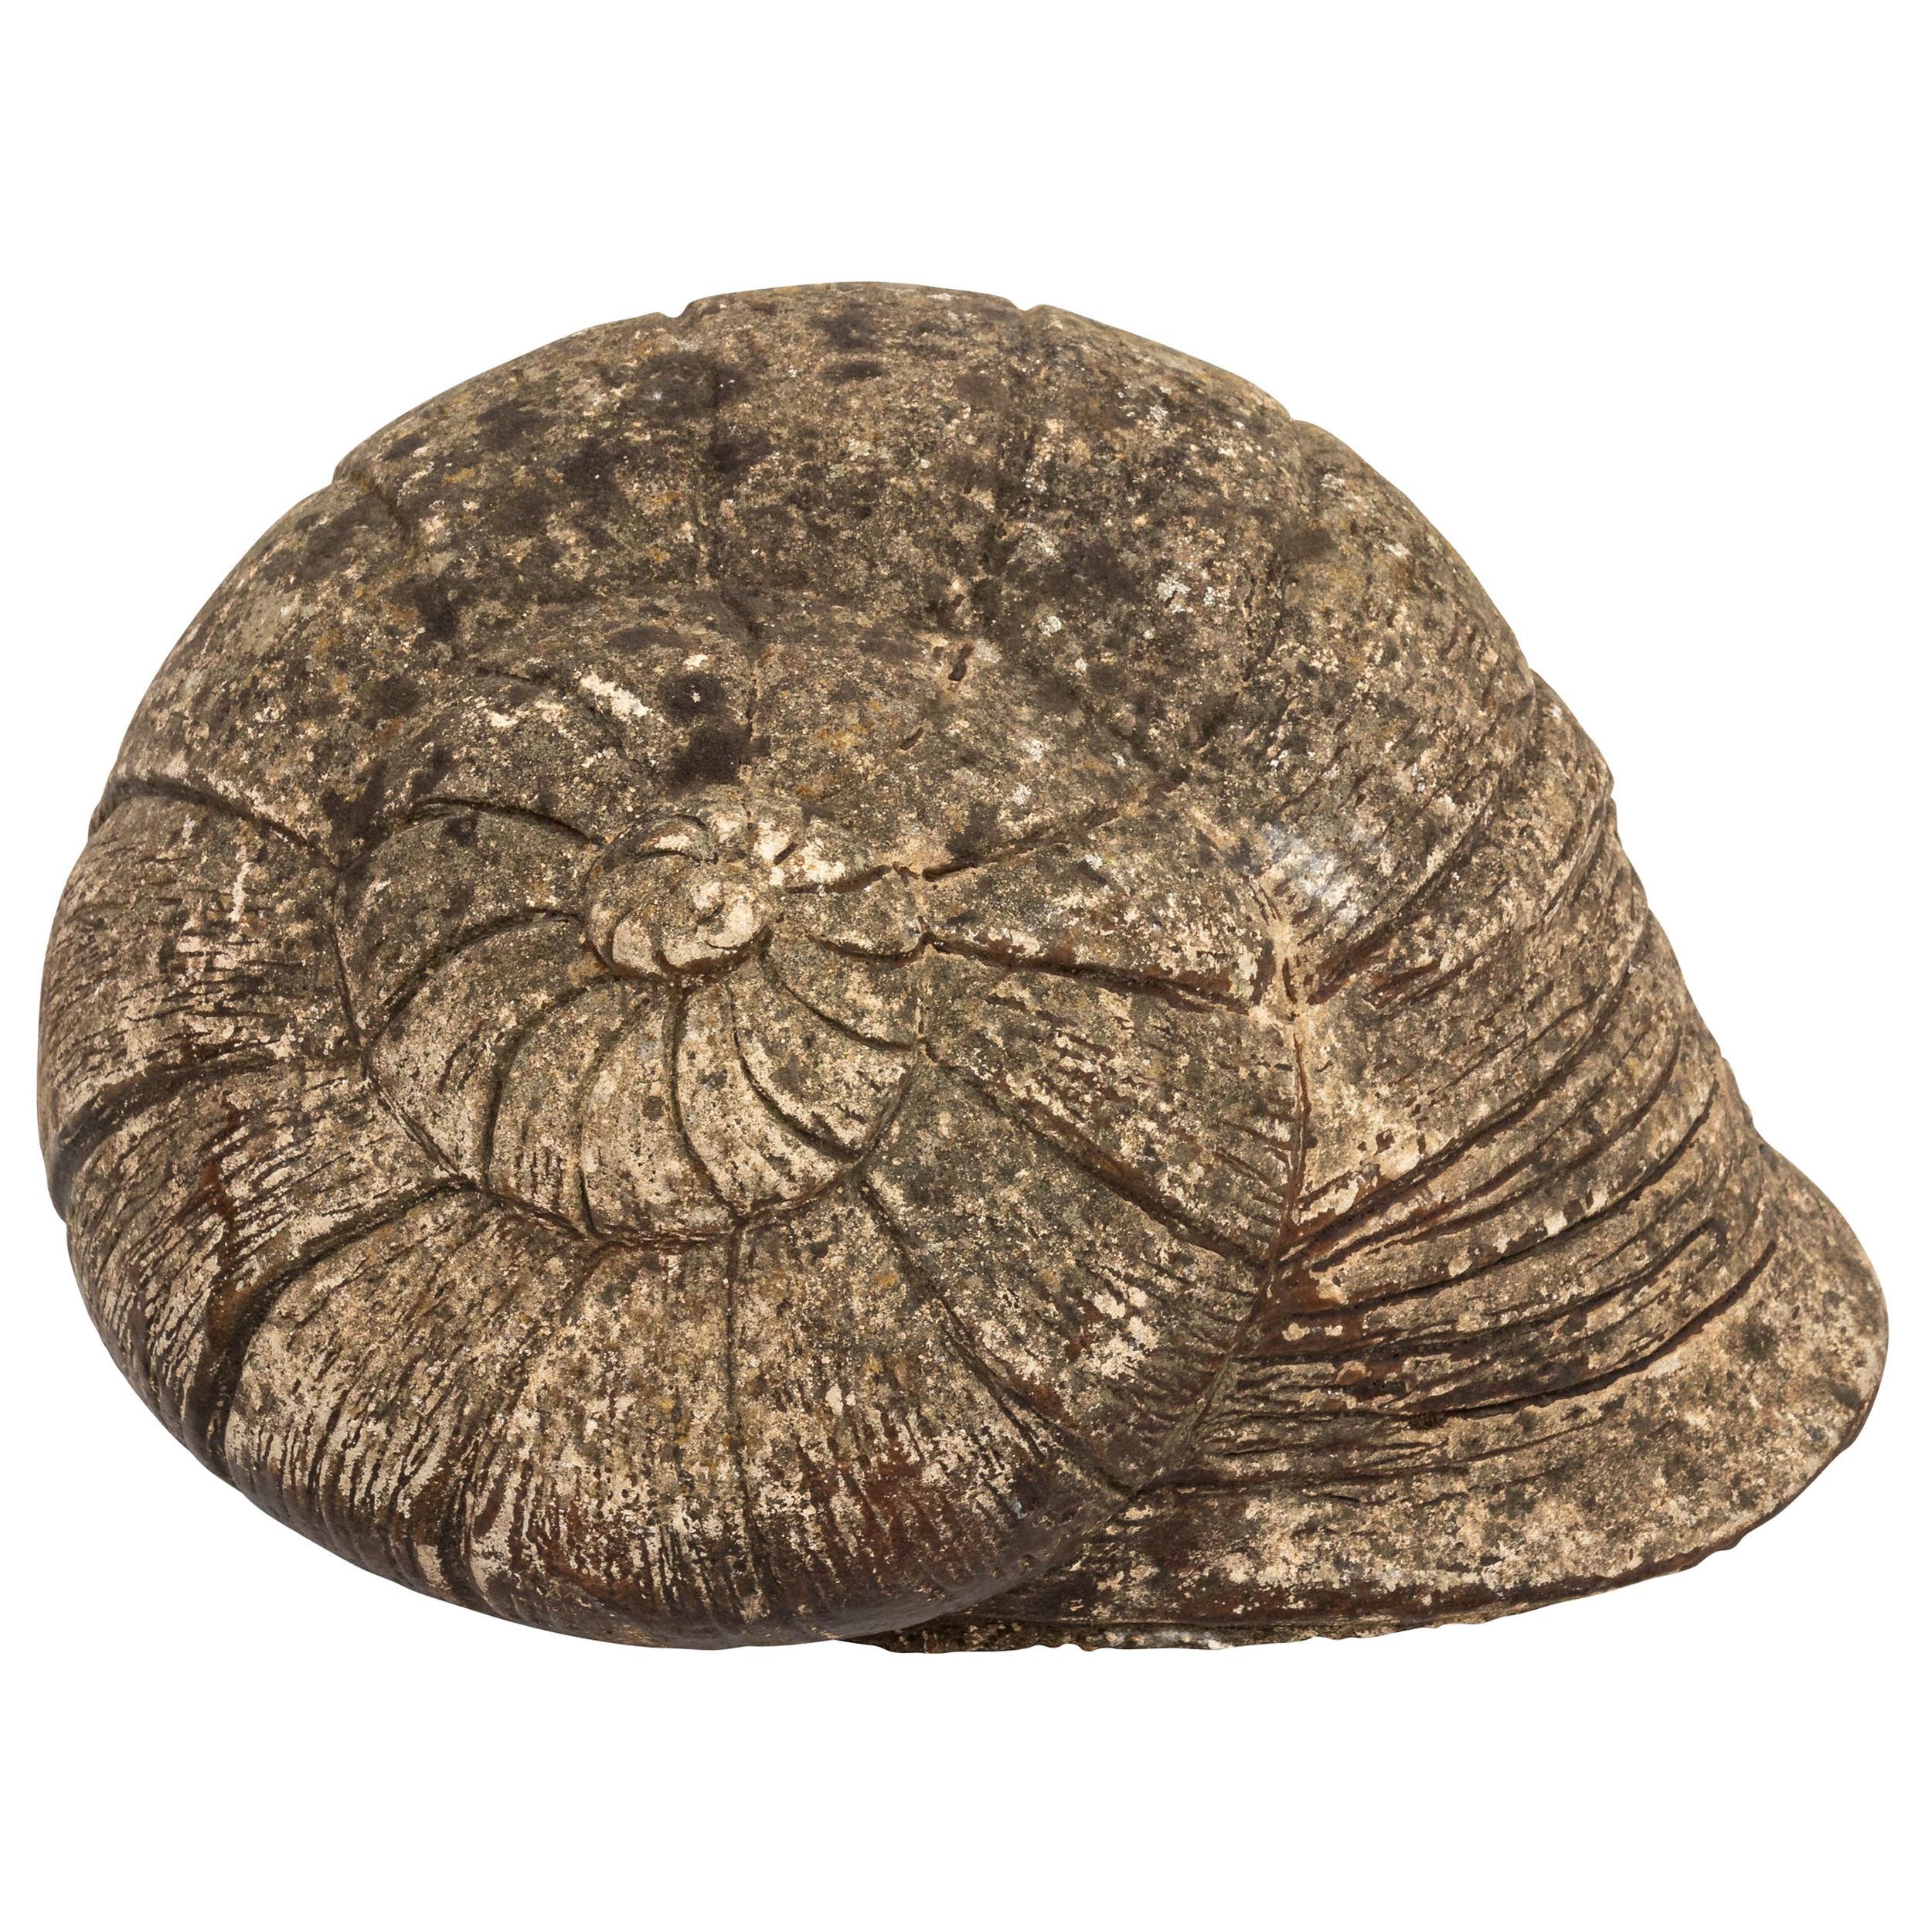 Vintage Cast Stone Snail Shell Garden Ornament